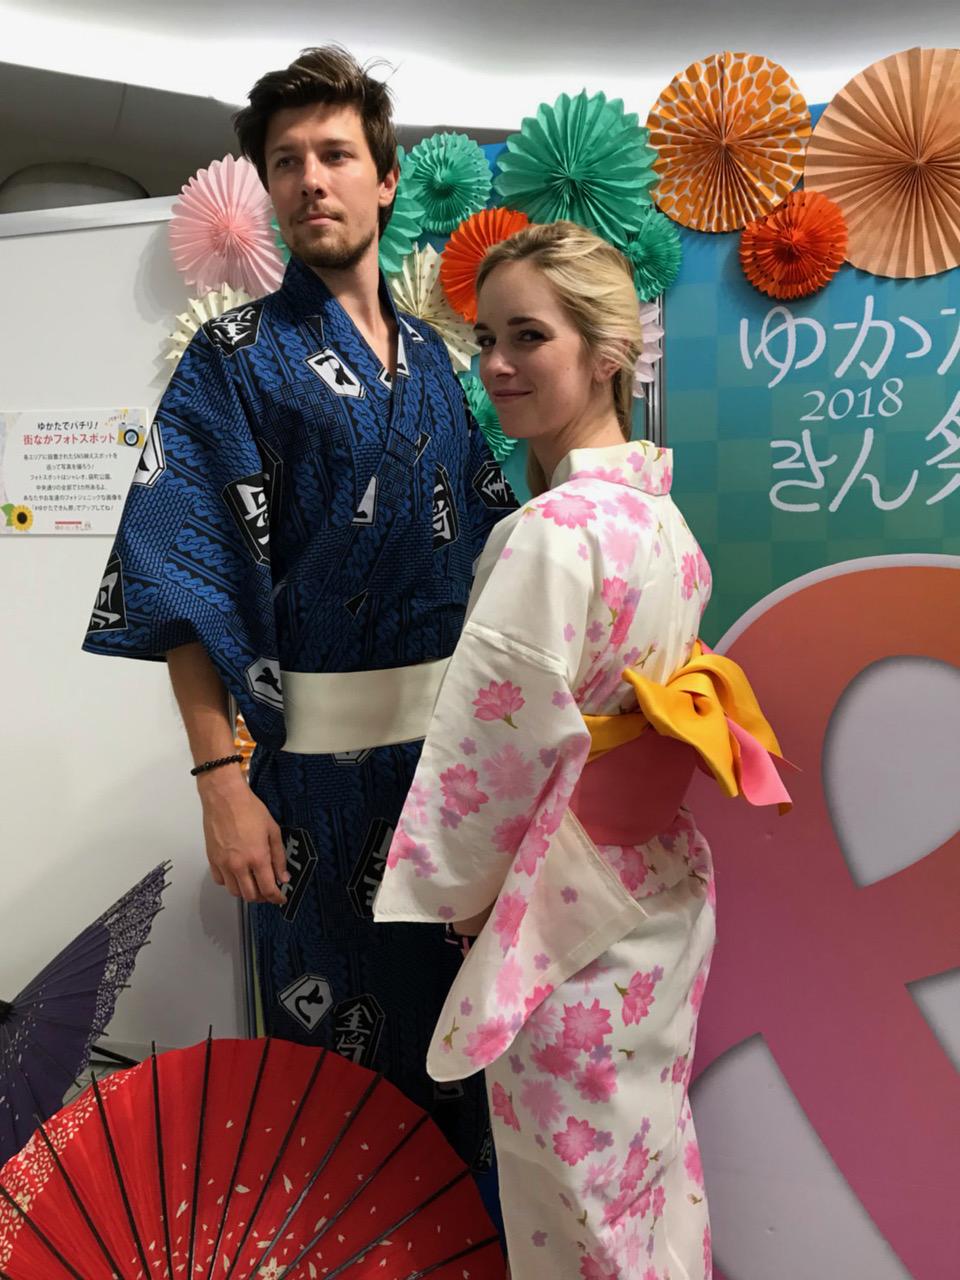 http://kimonokitsuke.com/news/1806%E3%82%86%E3%81%8B%E3%81%9F%E3%81%A6%E3%82%99%E3%81%8D%E3%82%93%E3%81%95%E3%81%84_1.jpeg